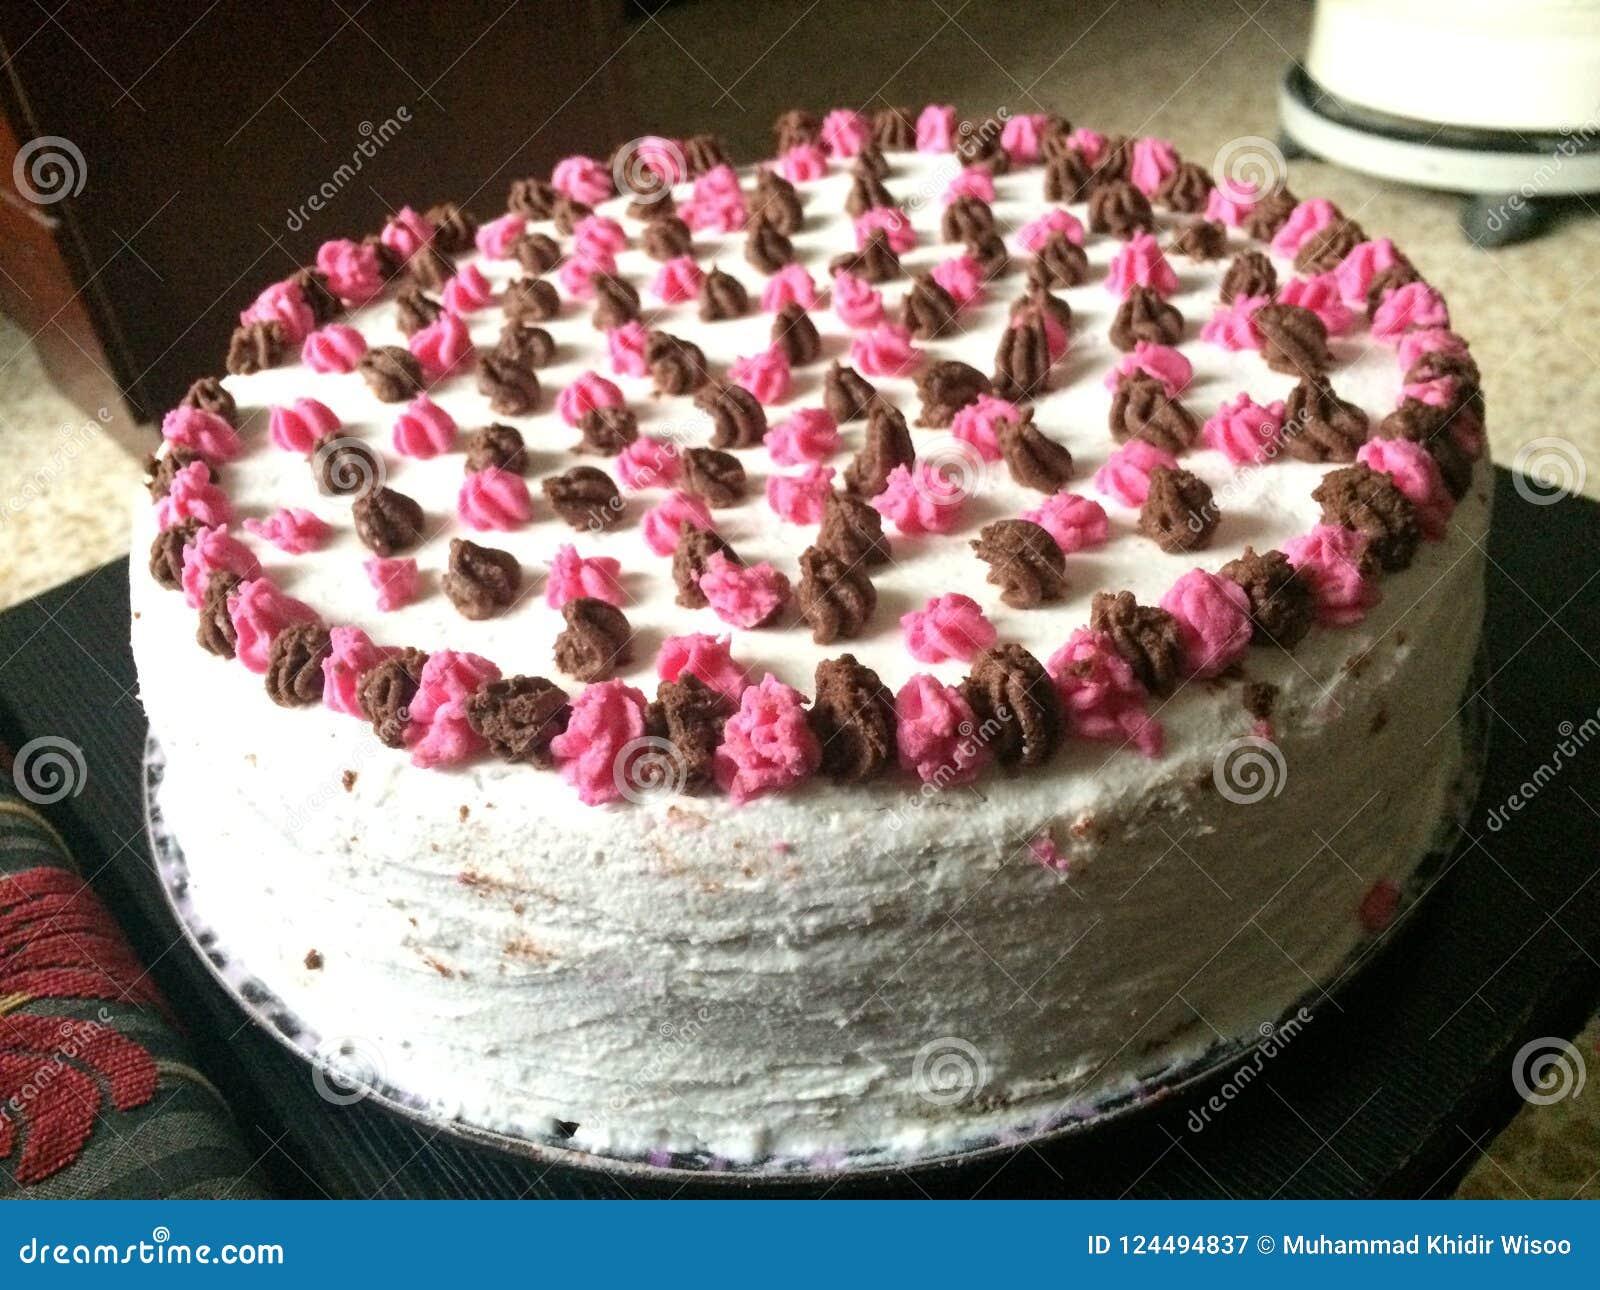 Phenomenal Birthday Cake Stock Image Image Of Party Prepared 124494837 Funny Birthday Cards Online Aboleapandamsfinfo